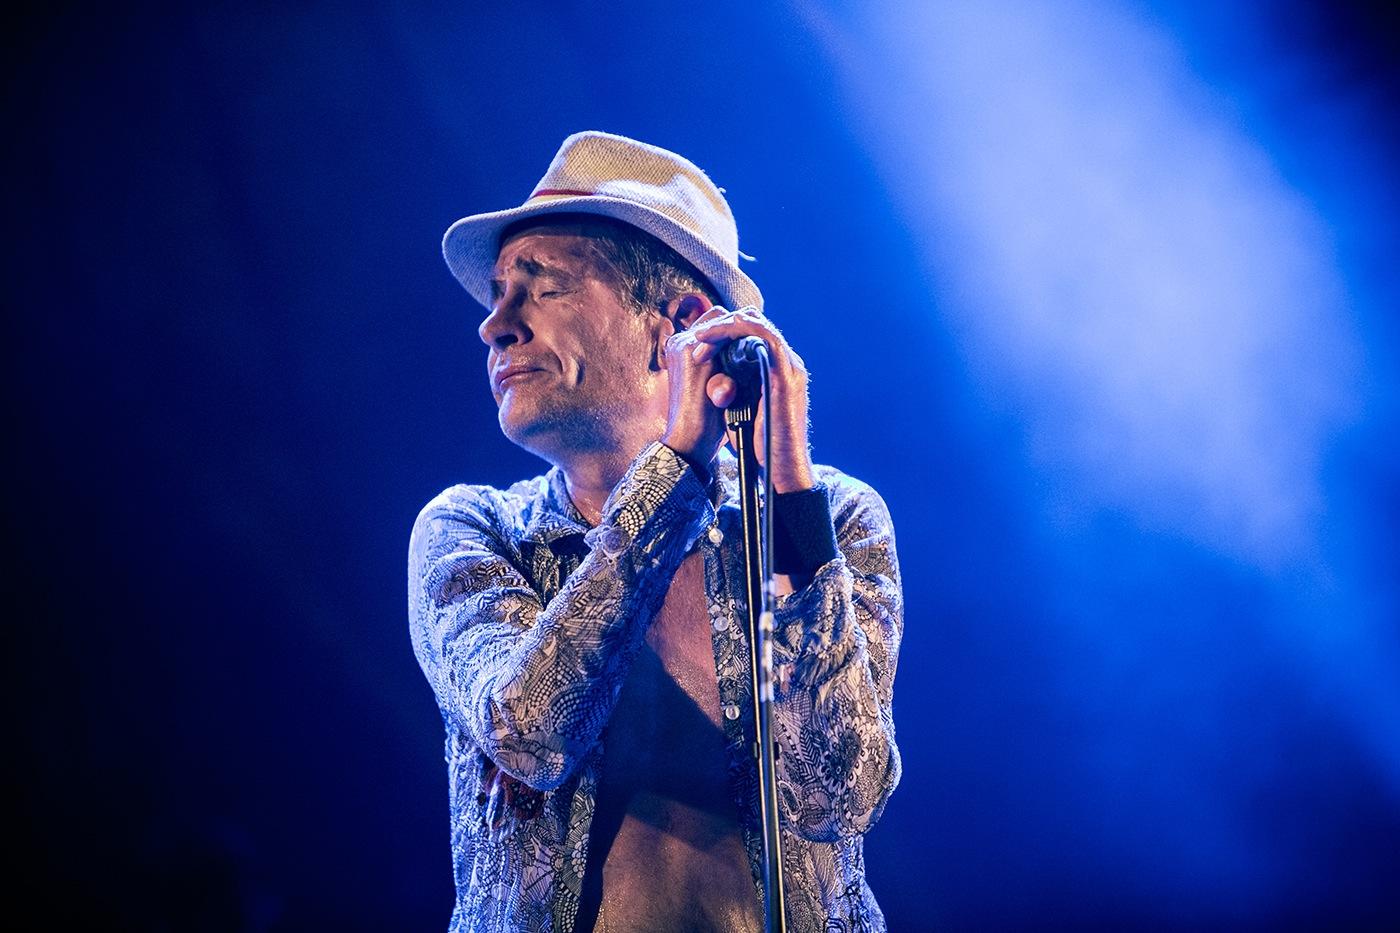 Didier Wampas (Bec) - Festival Rockadel 2012 - Poitiers